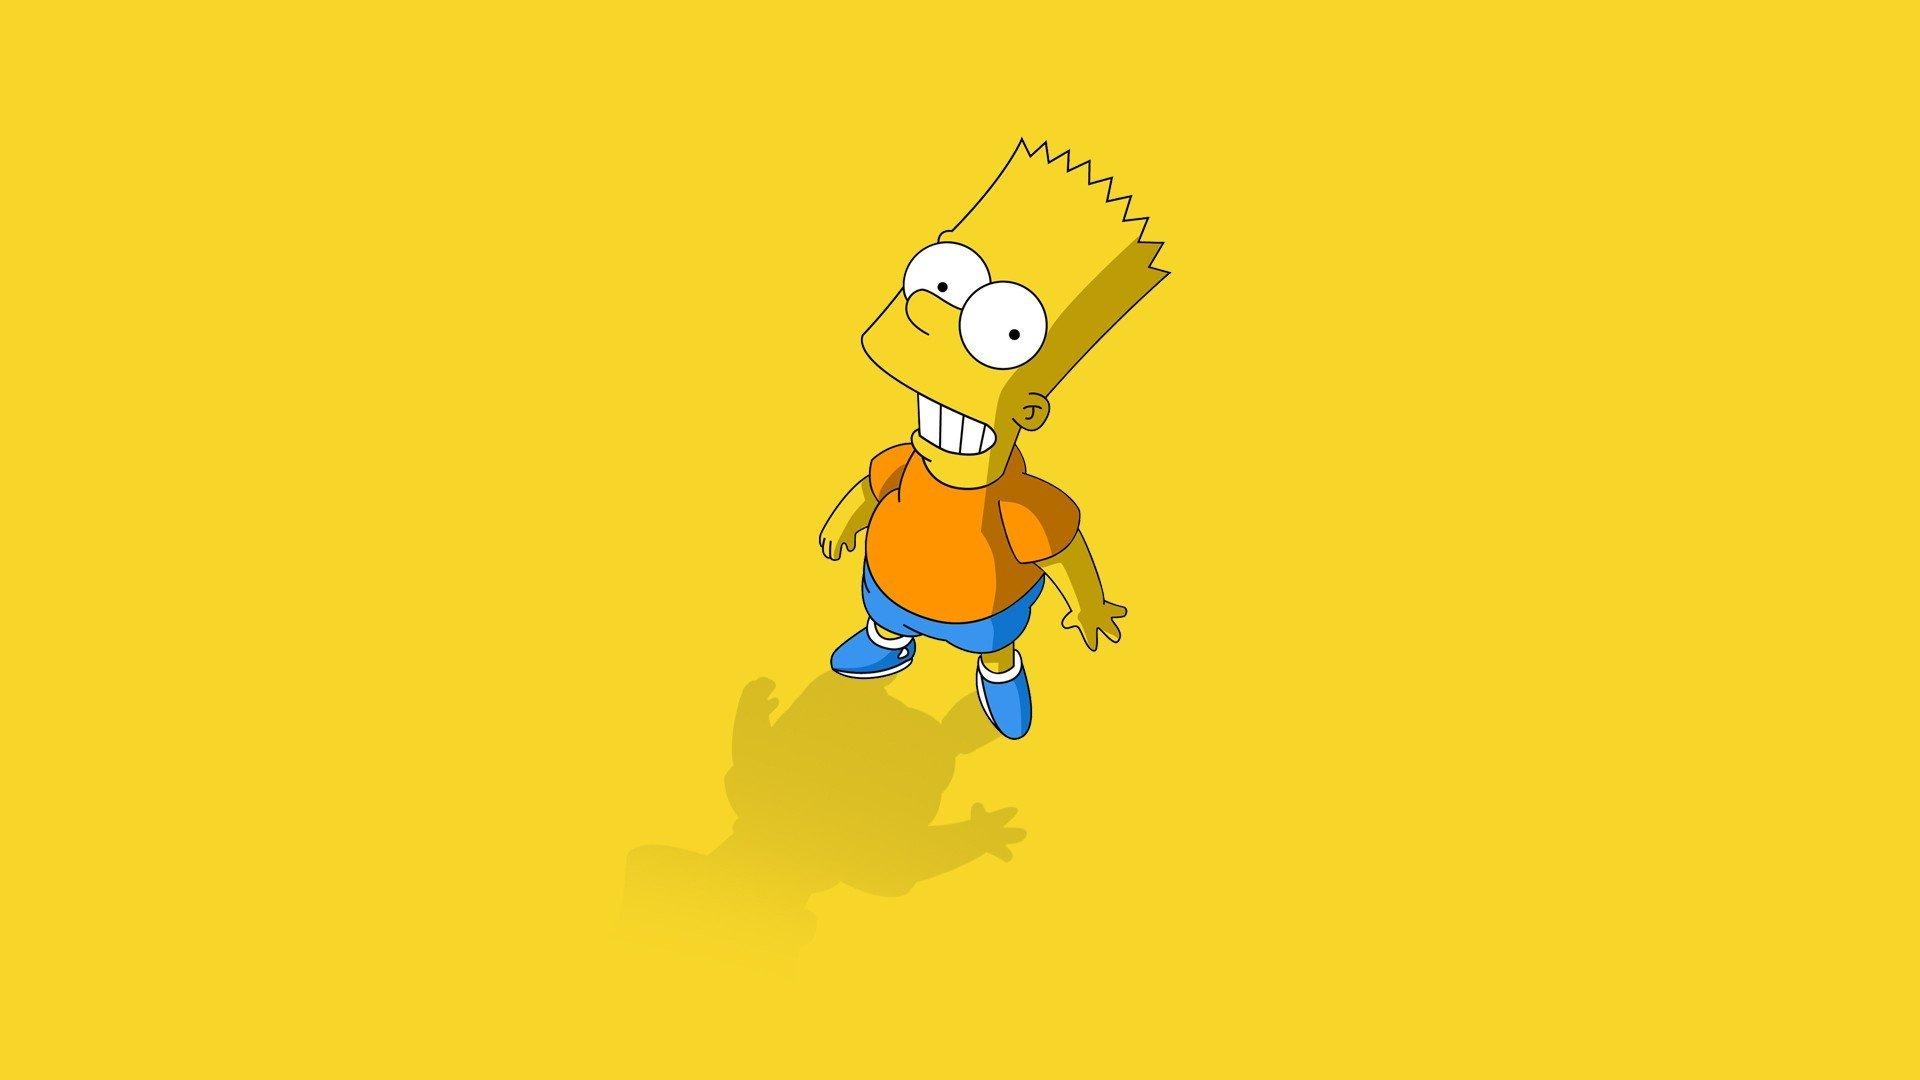 The Simpsons Wallpaper HD   Wallpaper High Definition 1920x1080